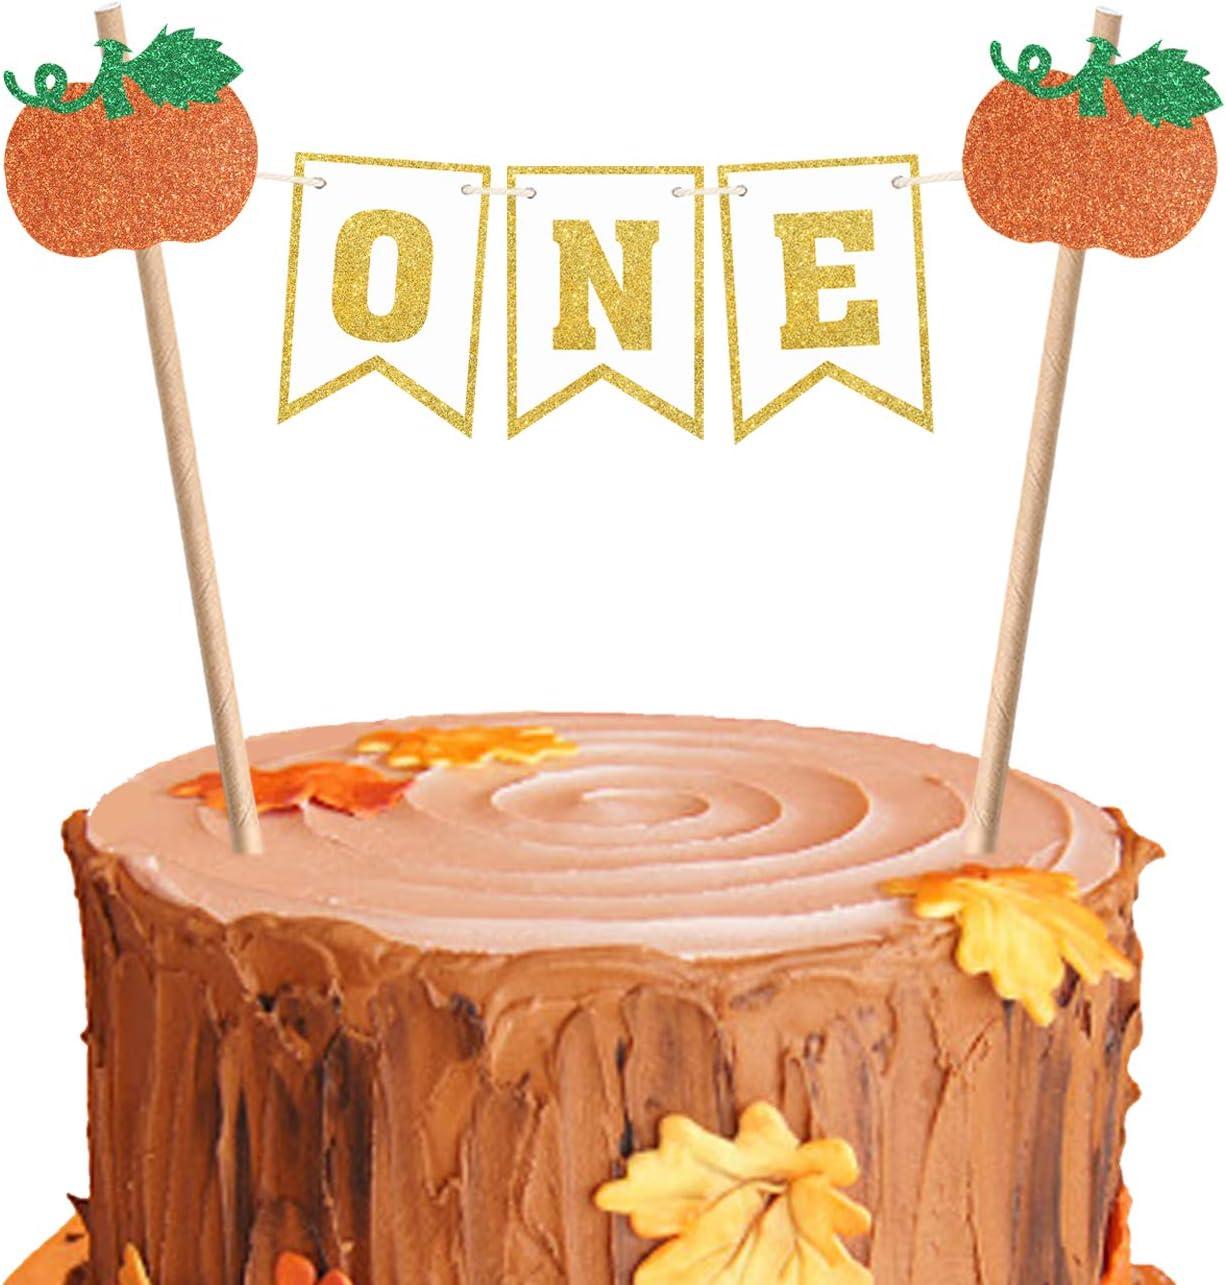 Pumpkin Cake Topper First Birthday Rustic Banner 1st Cake Topper One Cake Topper Pumpkin Burlap Cake Topper Topper Cake Topper